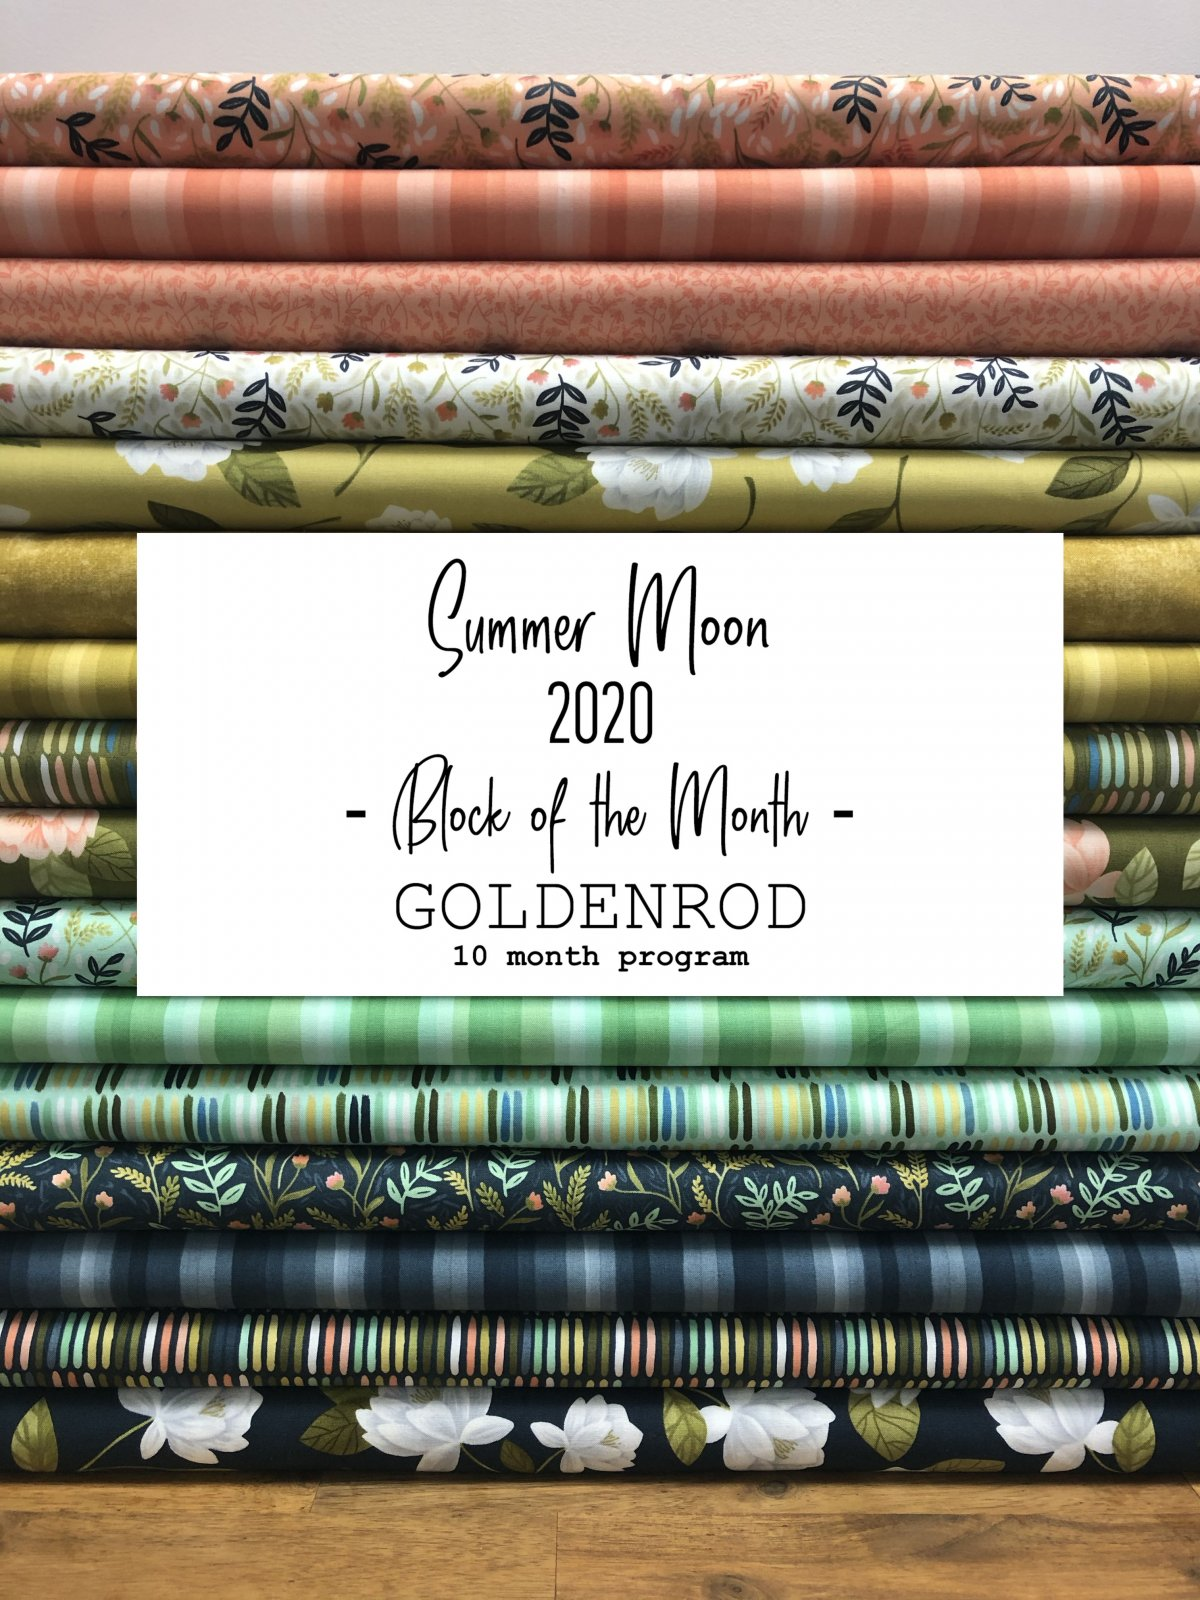 2020 Summer Moon BOM - Goldenrod